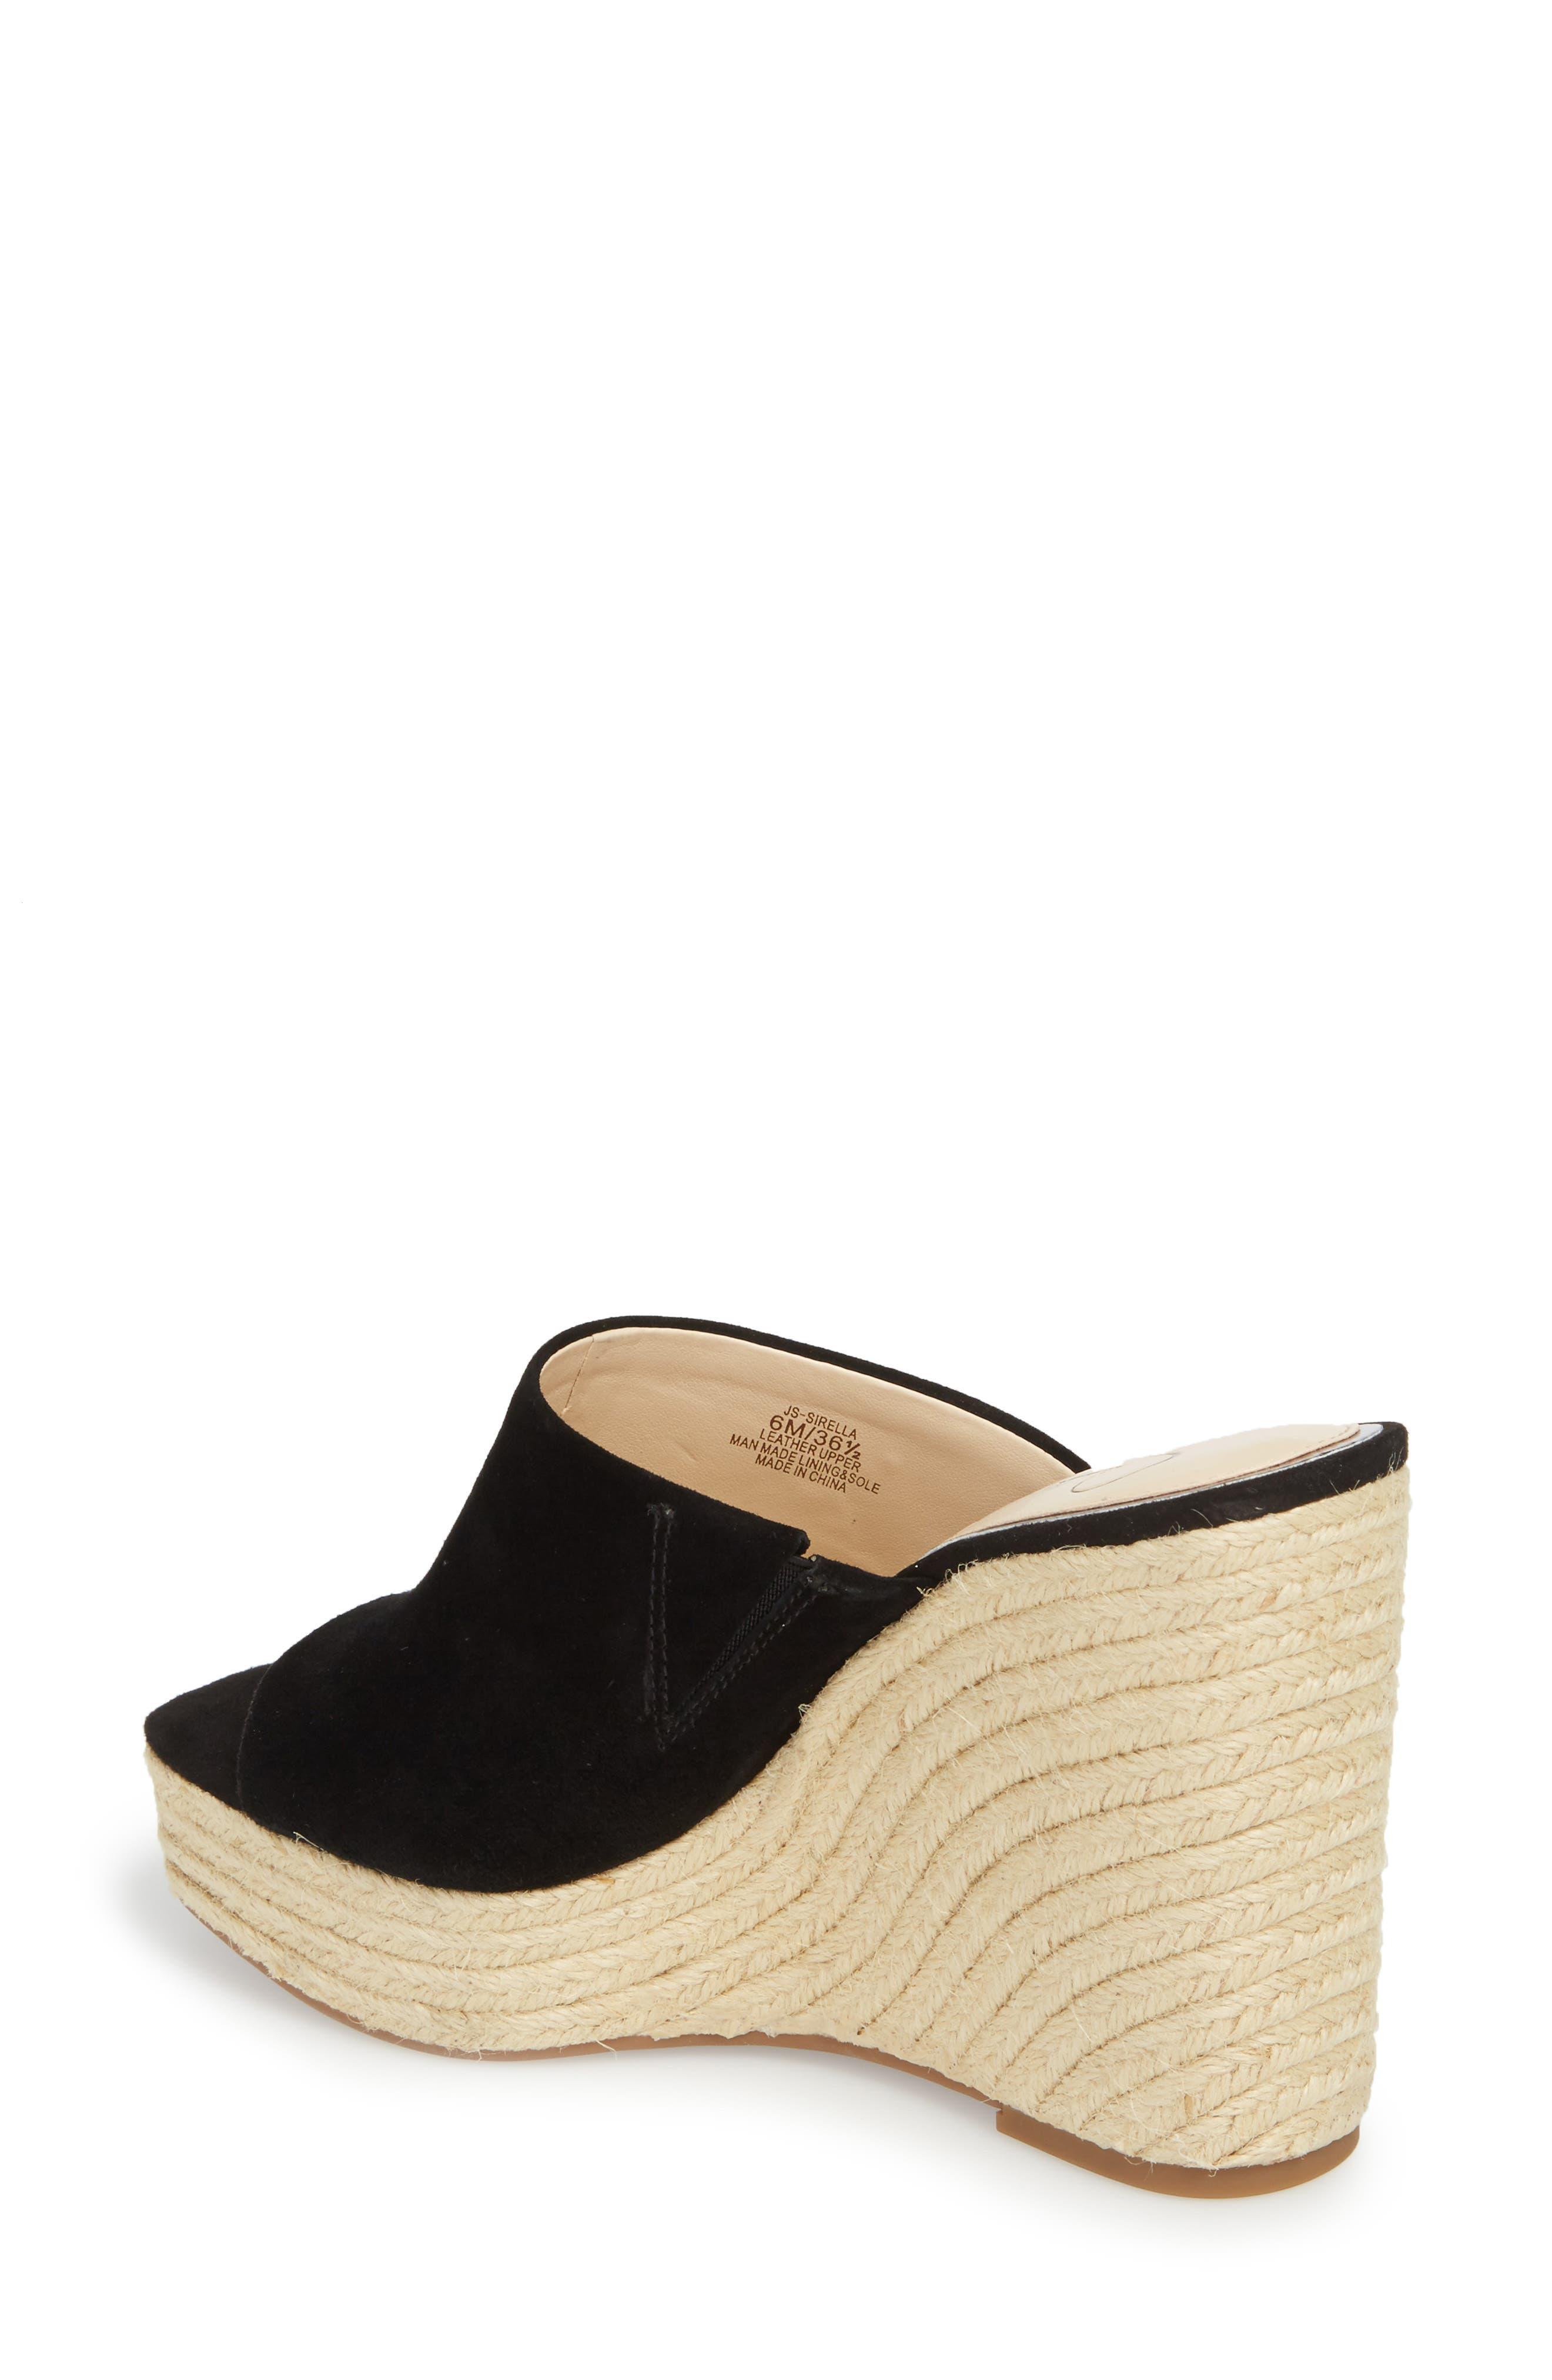 Sirella Platform Wedge Slide Sandal,                             Alternate thumbnail 4, color,